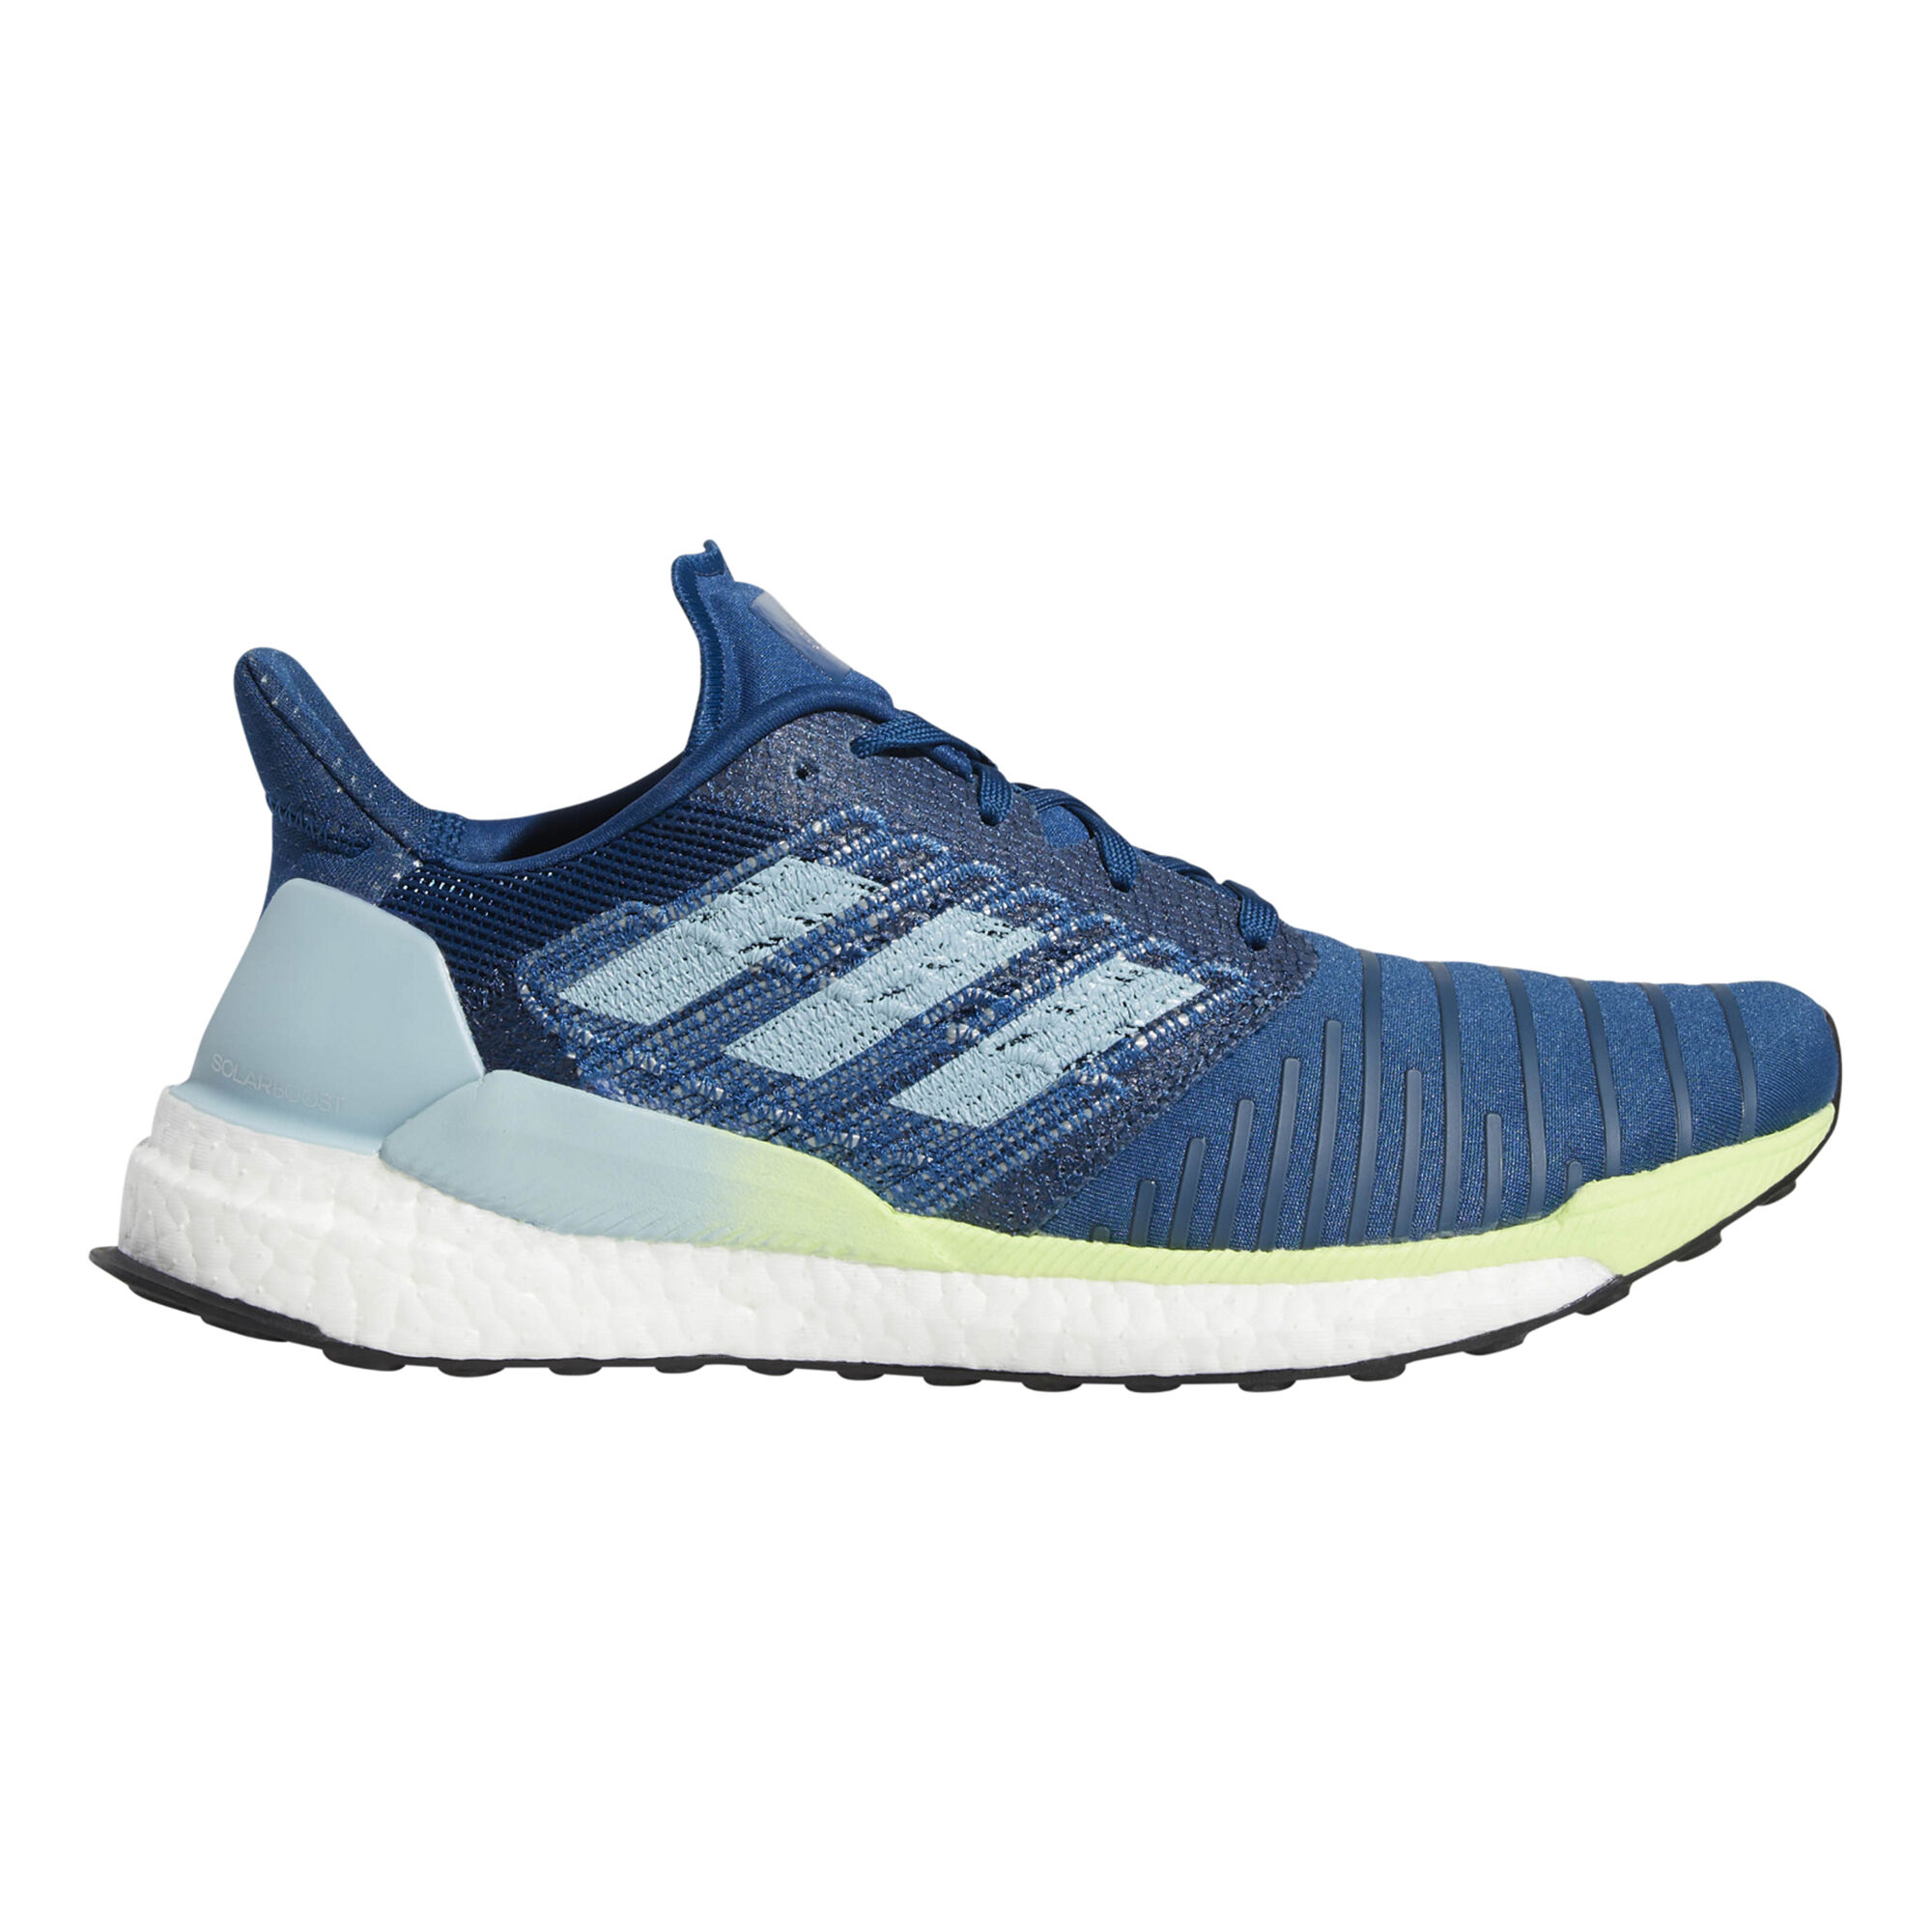 259a7ca3b buy adidas Solar Boost Neutral Running Shoe Men - Dark Blue